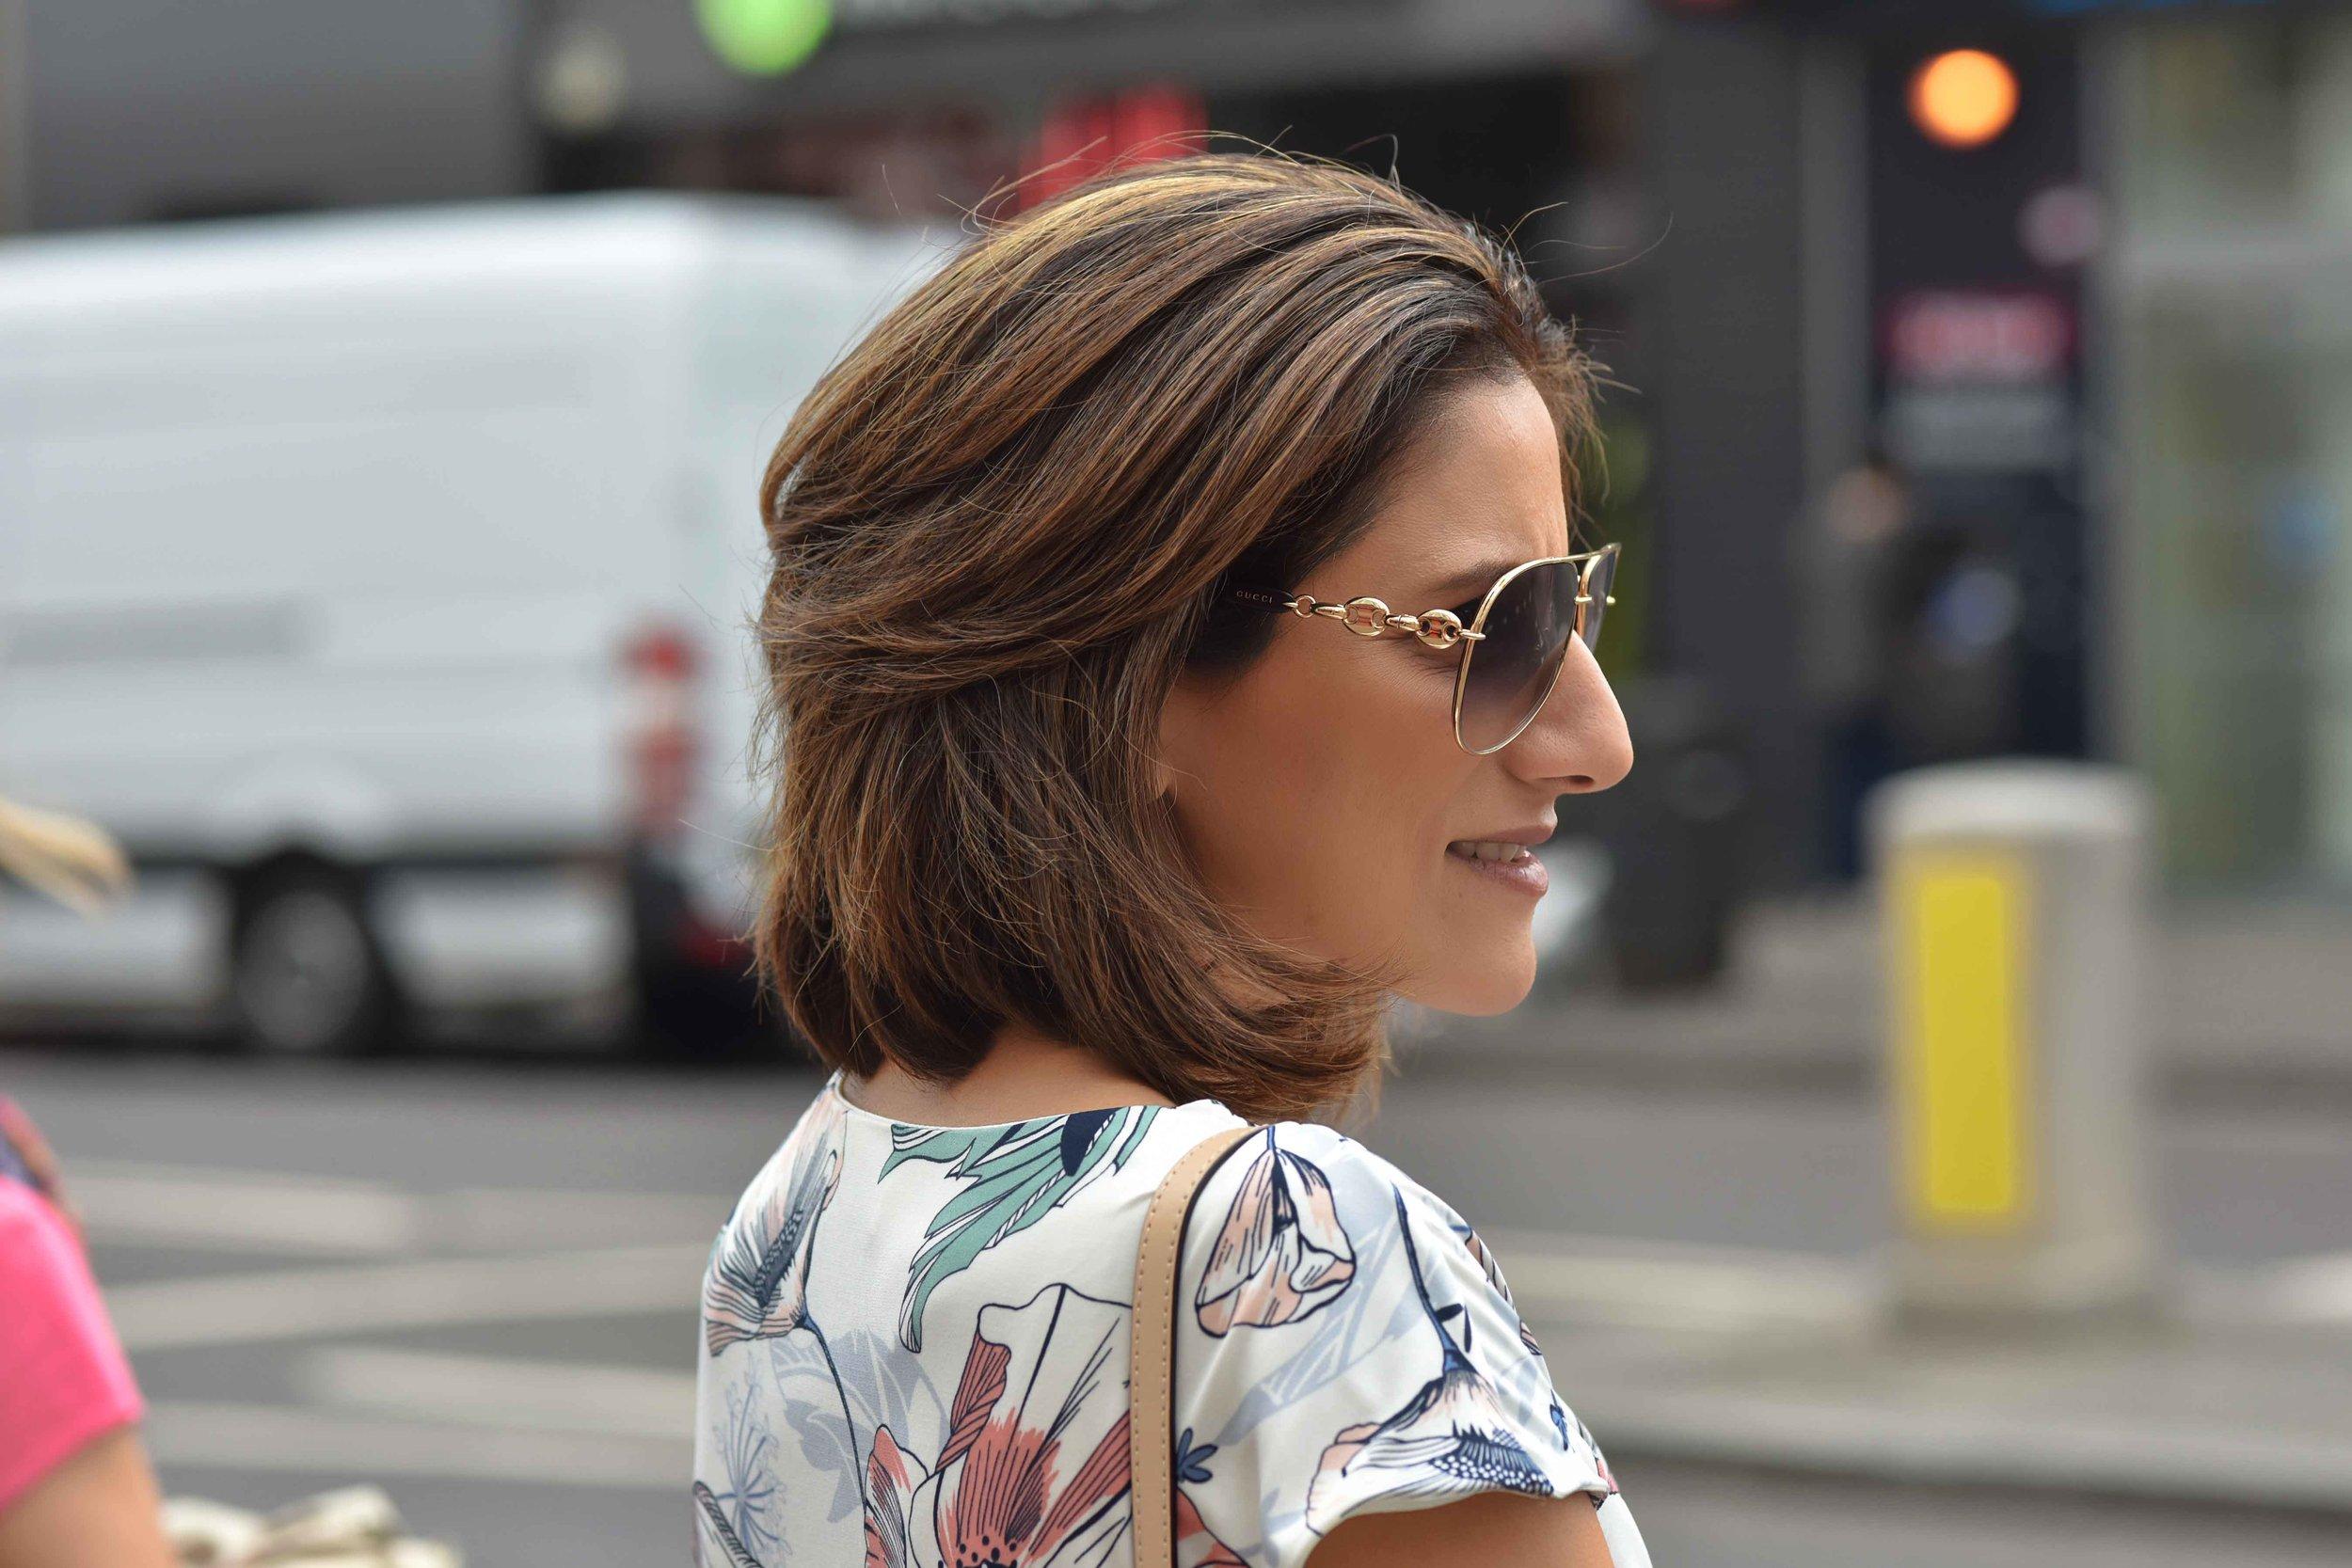 Marks and Spencer shift dress, Gucci sunglasses, street fashion, Shoreditch, London, U.K. Photo: Nina Shaw, Image©sourcingstyle.com